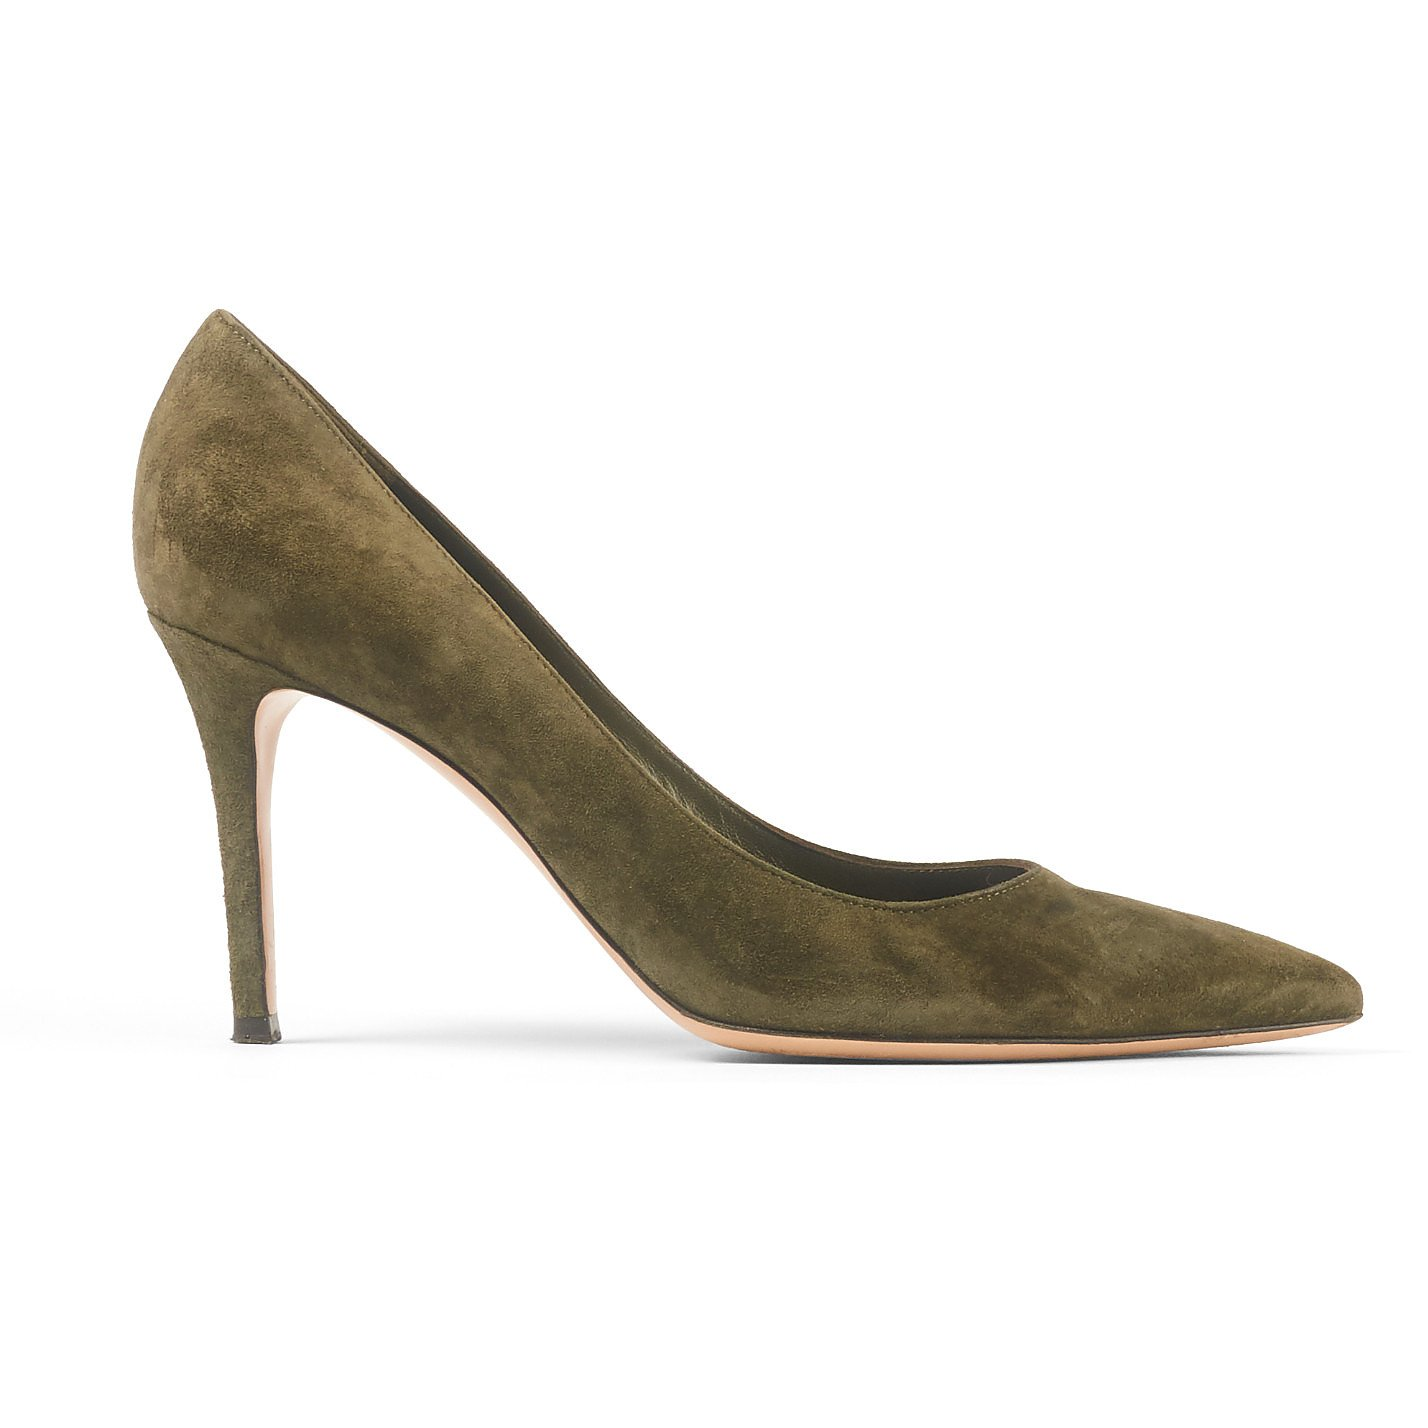 GIANVITO ROSSI Suede Stiletto Heels